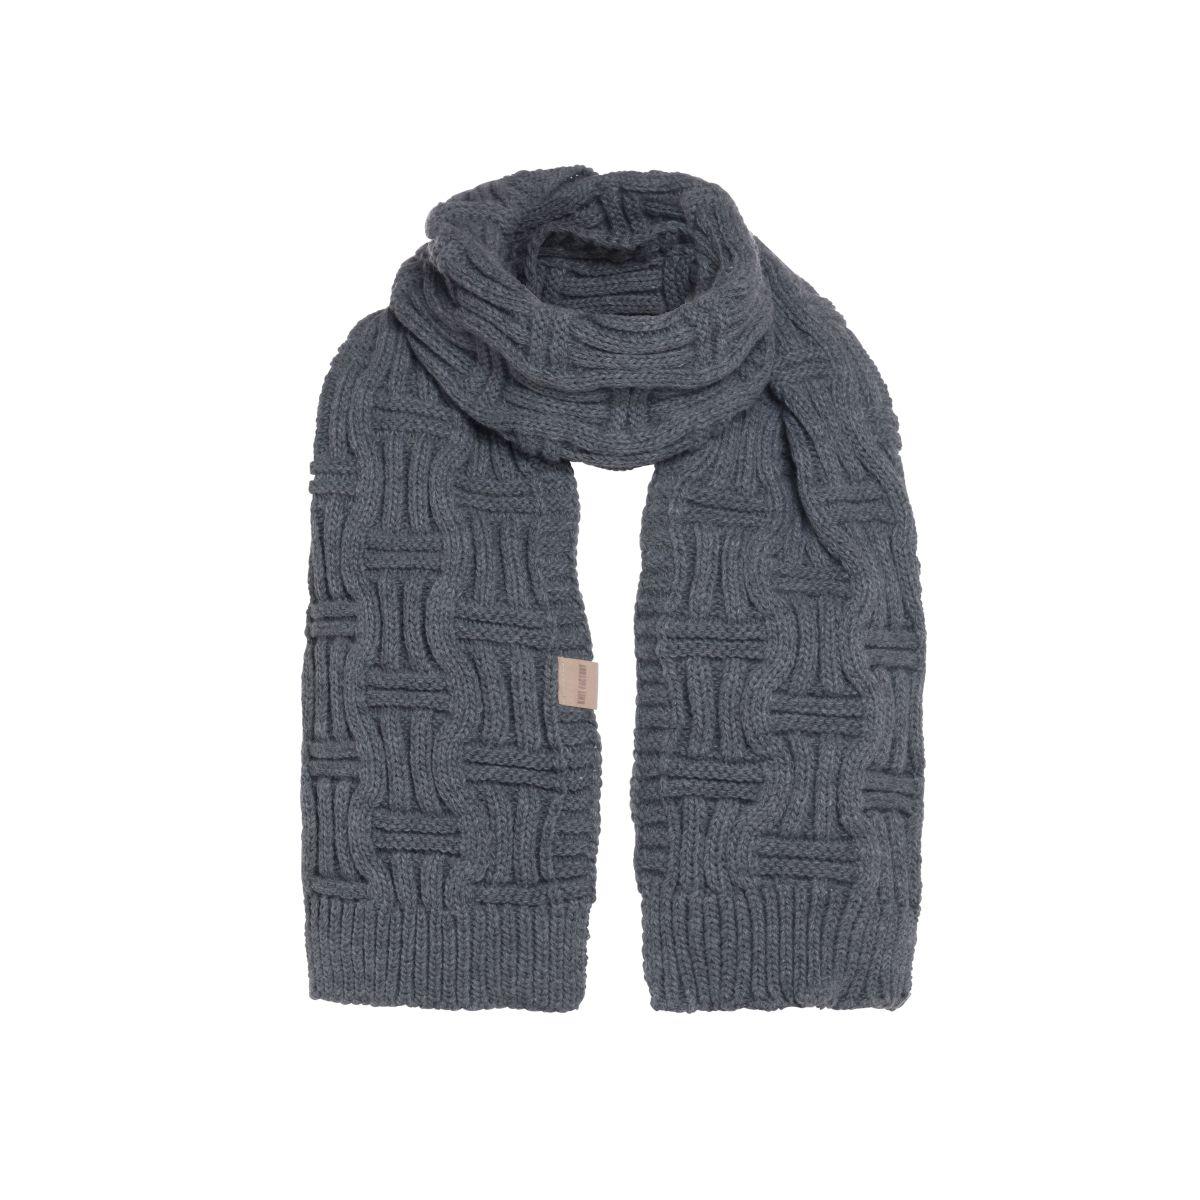 knit factory kf14406501050 bobby sjaal antraciet 1